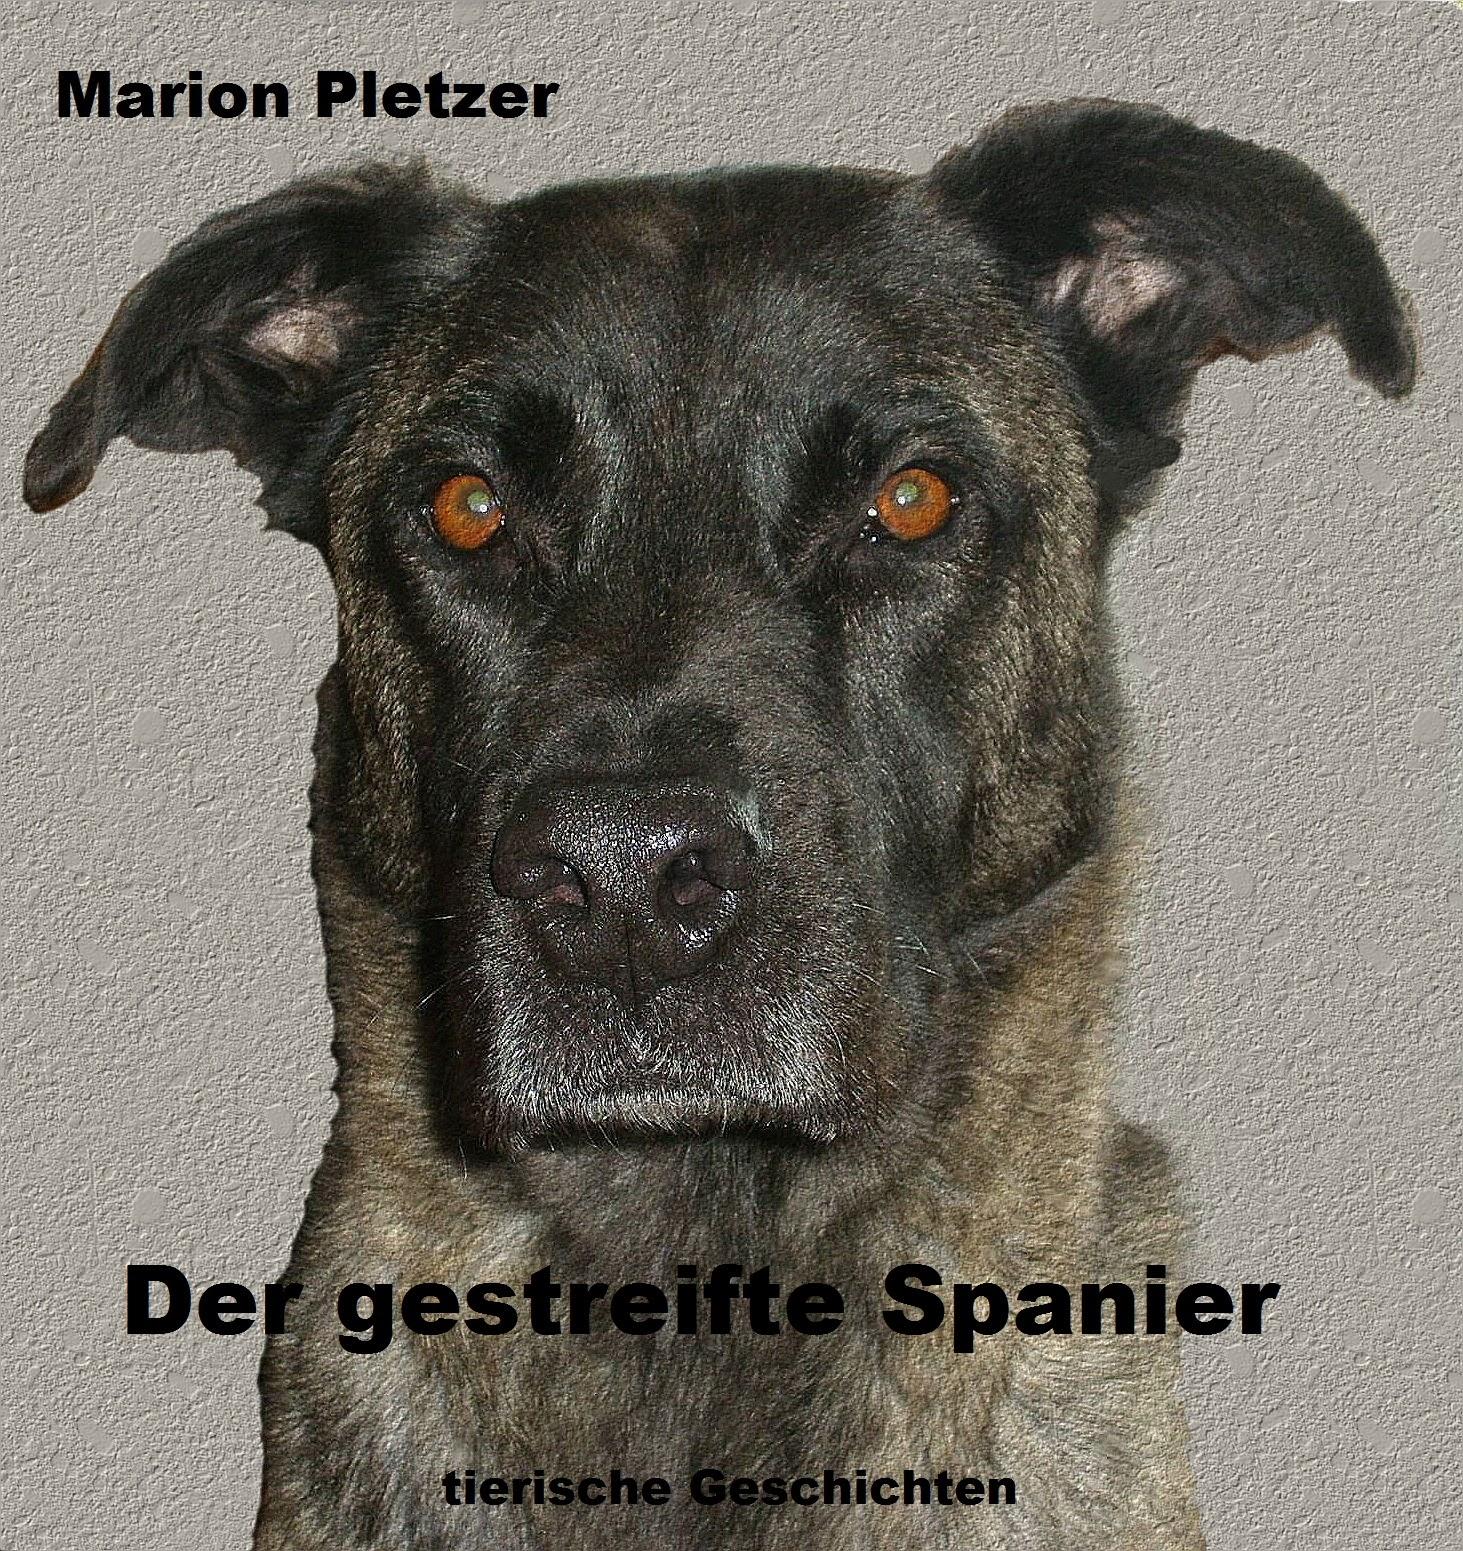 http://www.amazon.de/gestreifte-Spanier-Marion-Pletzer-ebook/dp/B004YTT23O/ref=sr_1_1?ie=UTF8&qid=1389472369&sr=8-1&keywords=der+gestreifte+spanier